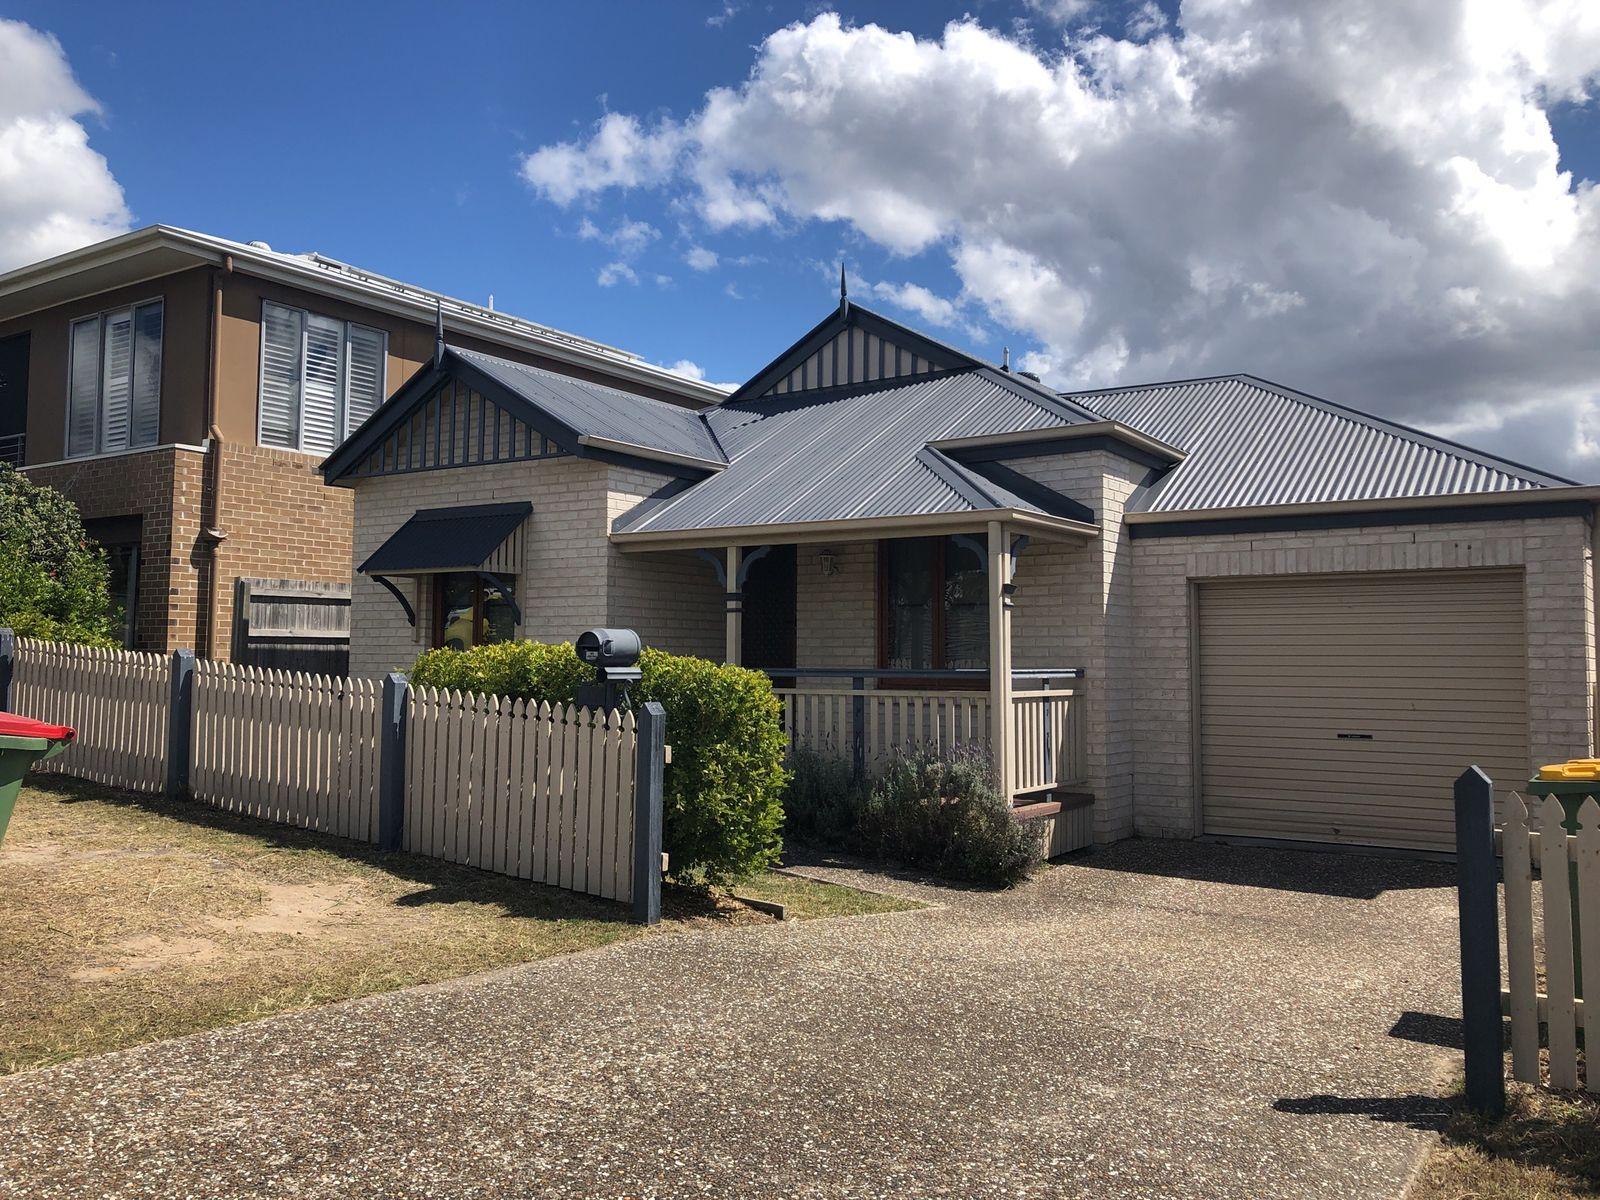 15 Hookes Terrace, Springfield Lakes, QLD 4300